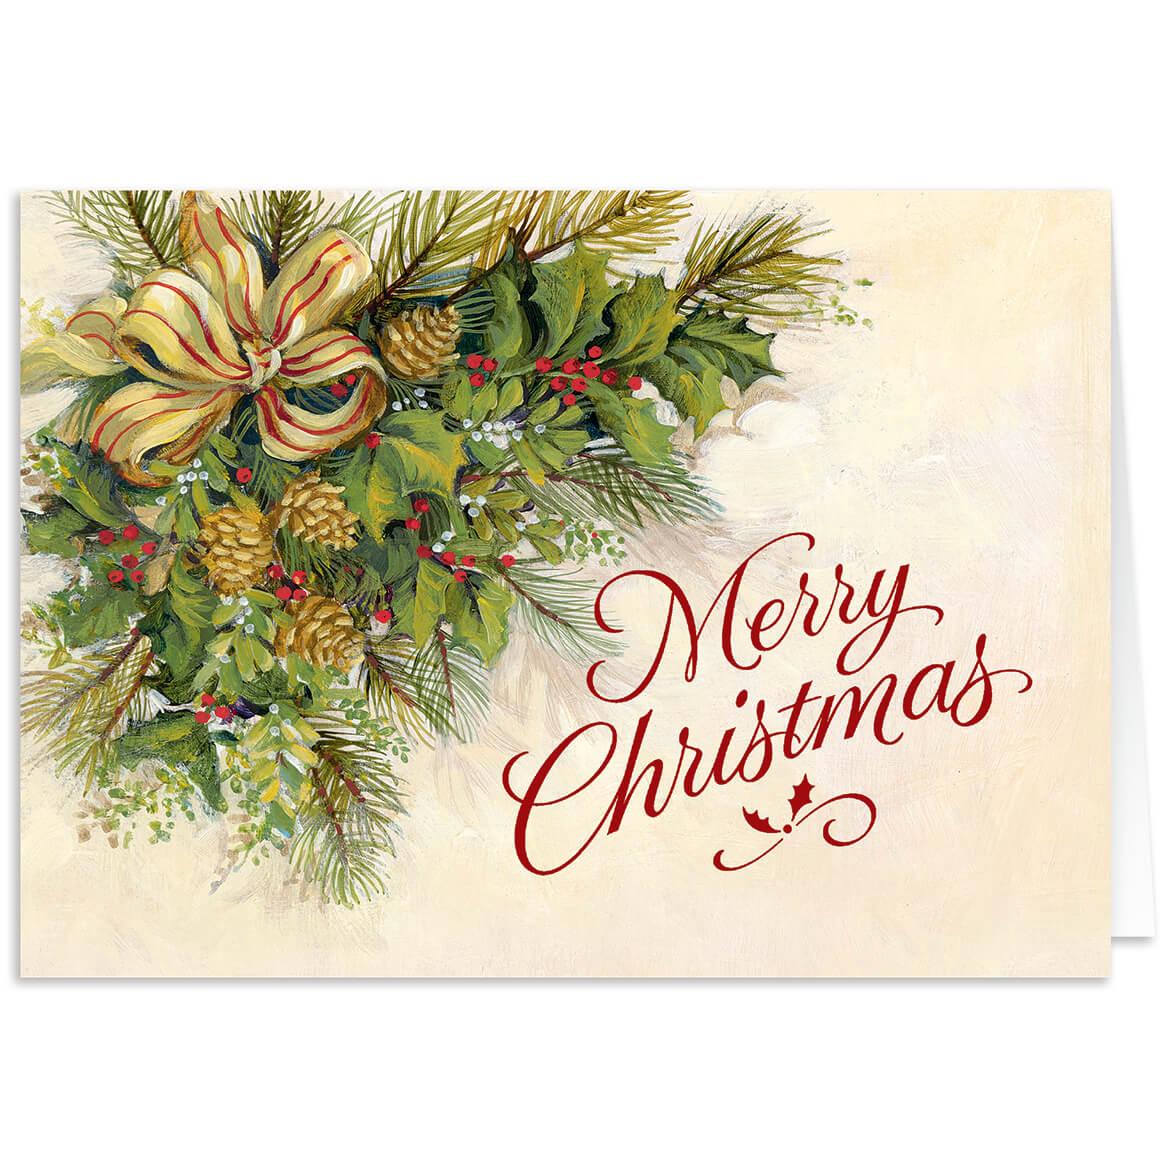 Christmas Greenery.Personalized Christmas Greenery Christmas Card Set Of 20